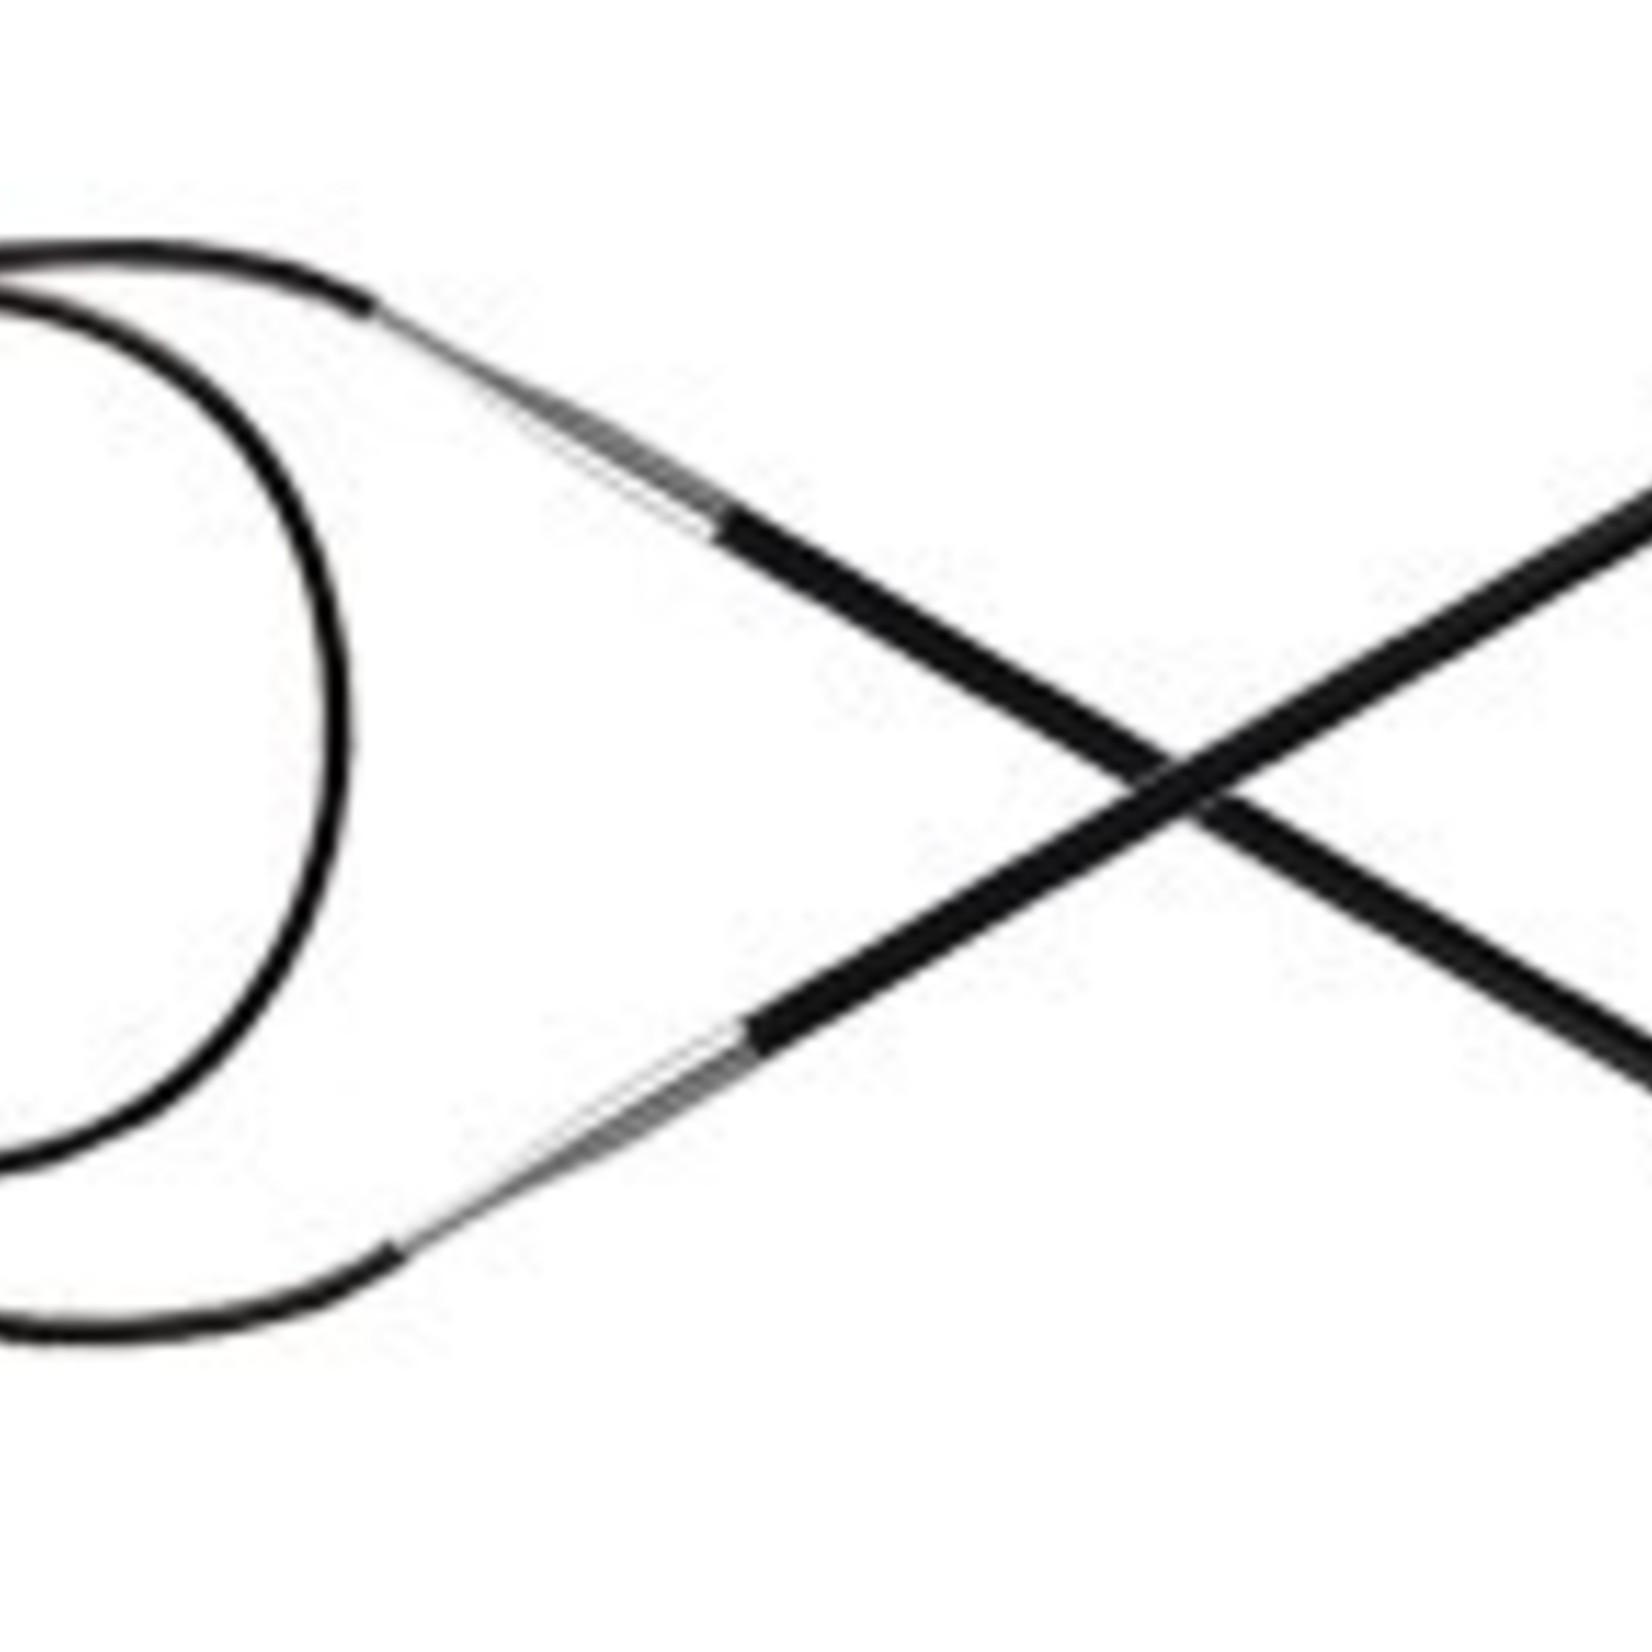 Knitter's Pride 5 Karbonz Circular 32